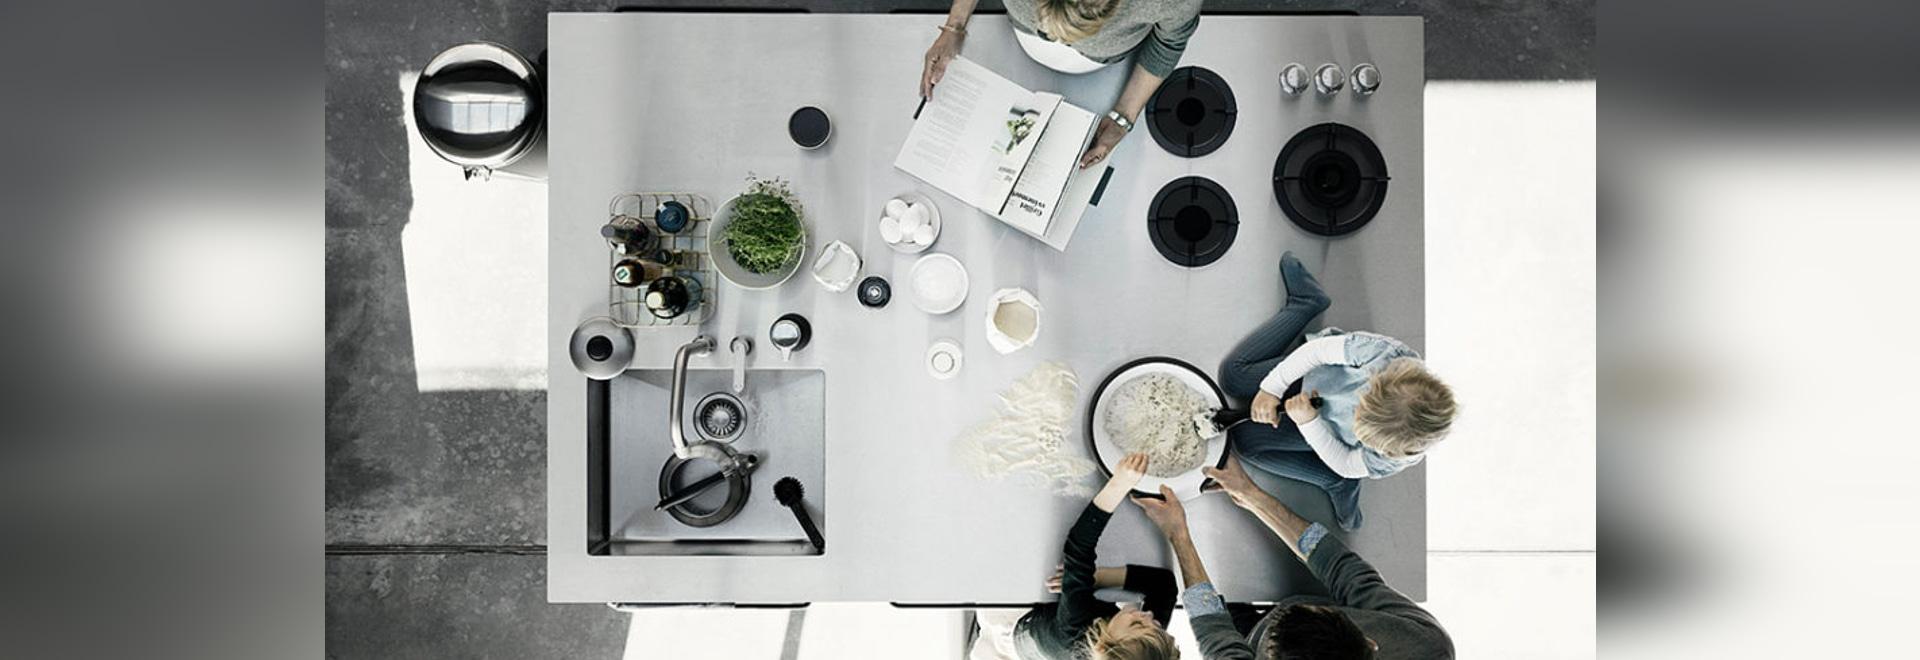 ISLAND moderne Küche by VIPP - VIPP